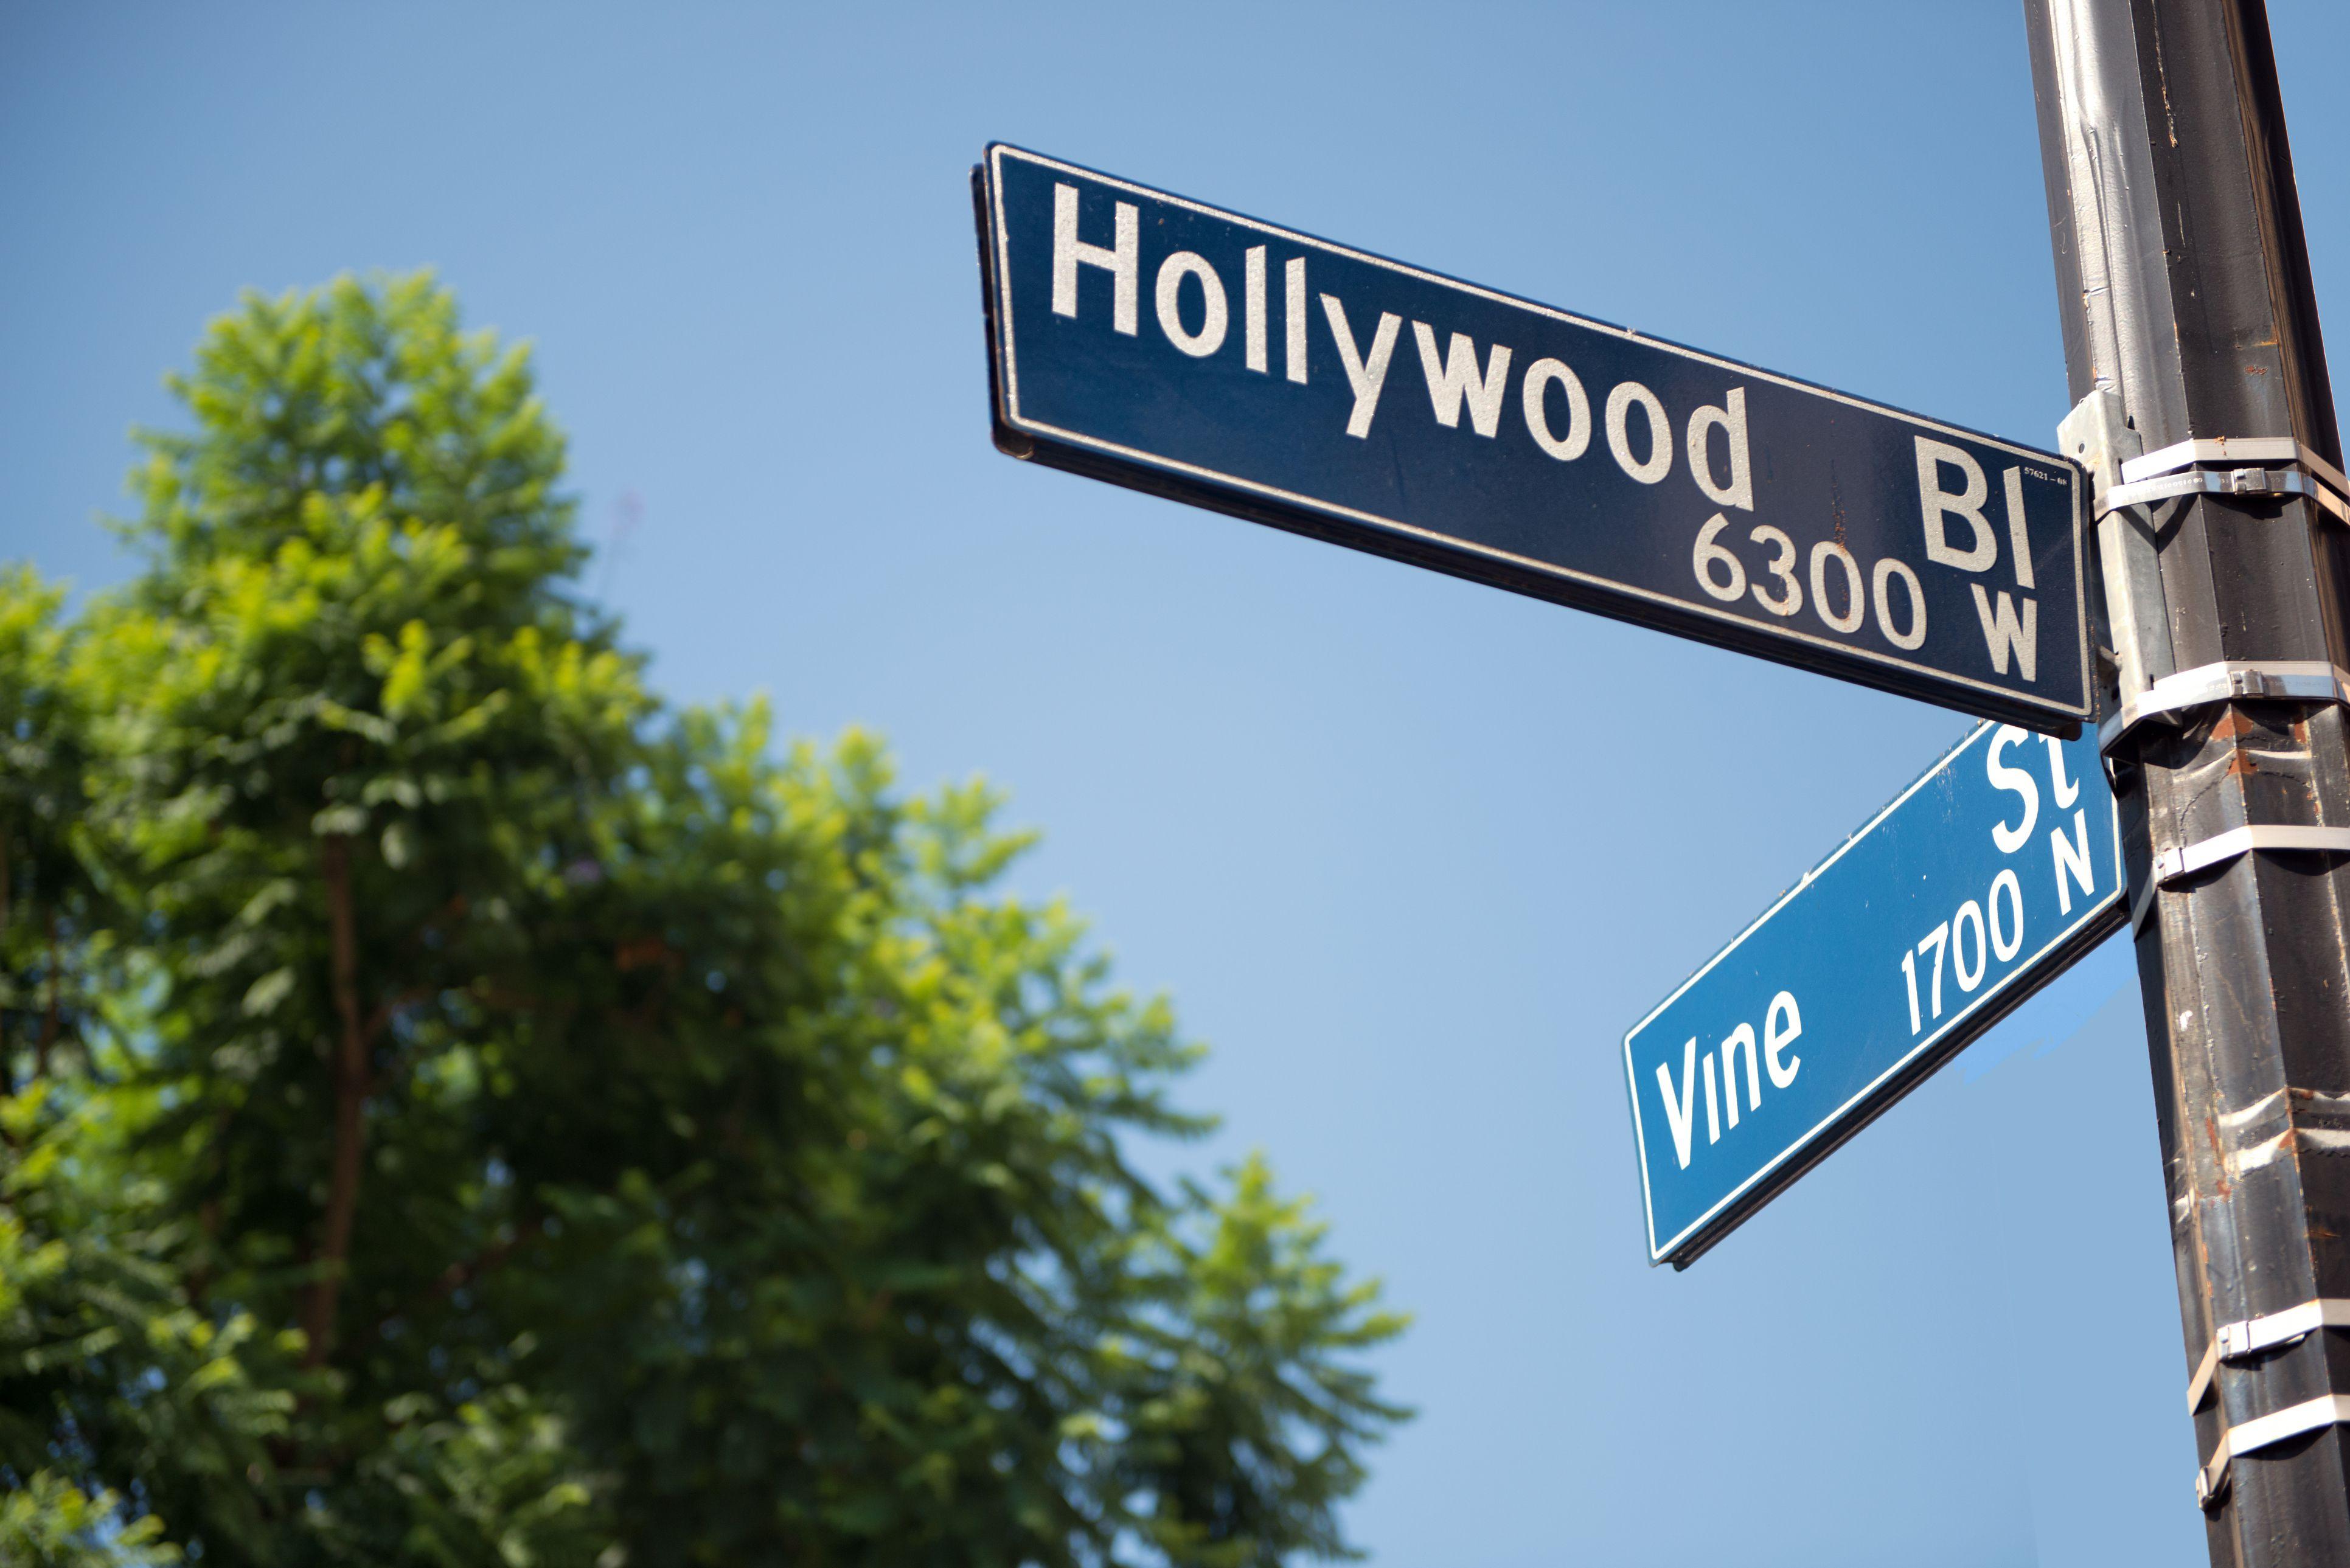 Hollywood Boulevard and Vine Street street signs, Hollywood, California, America, USA